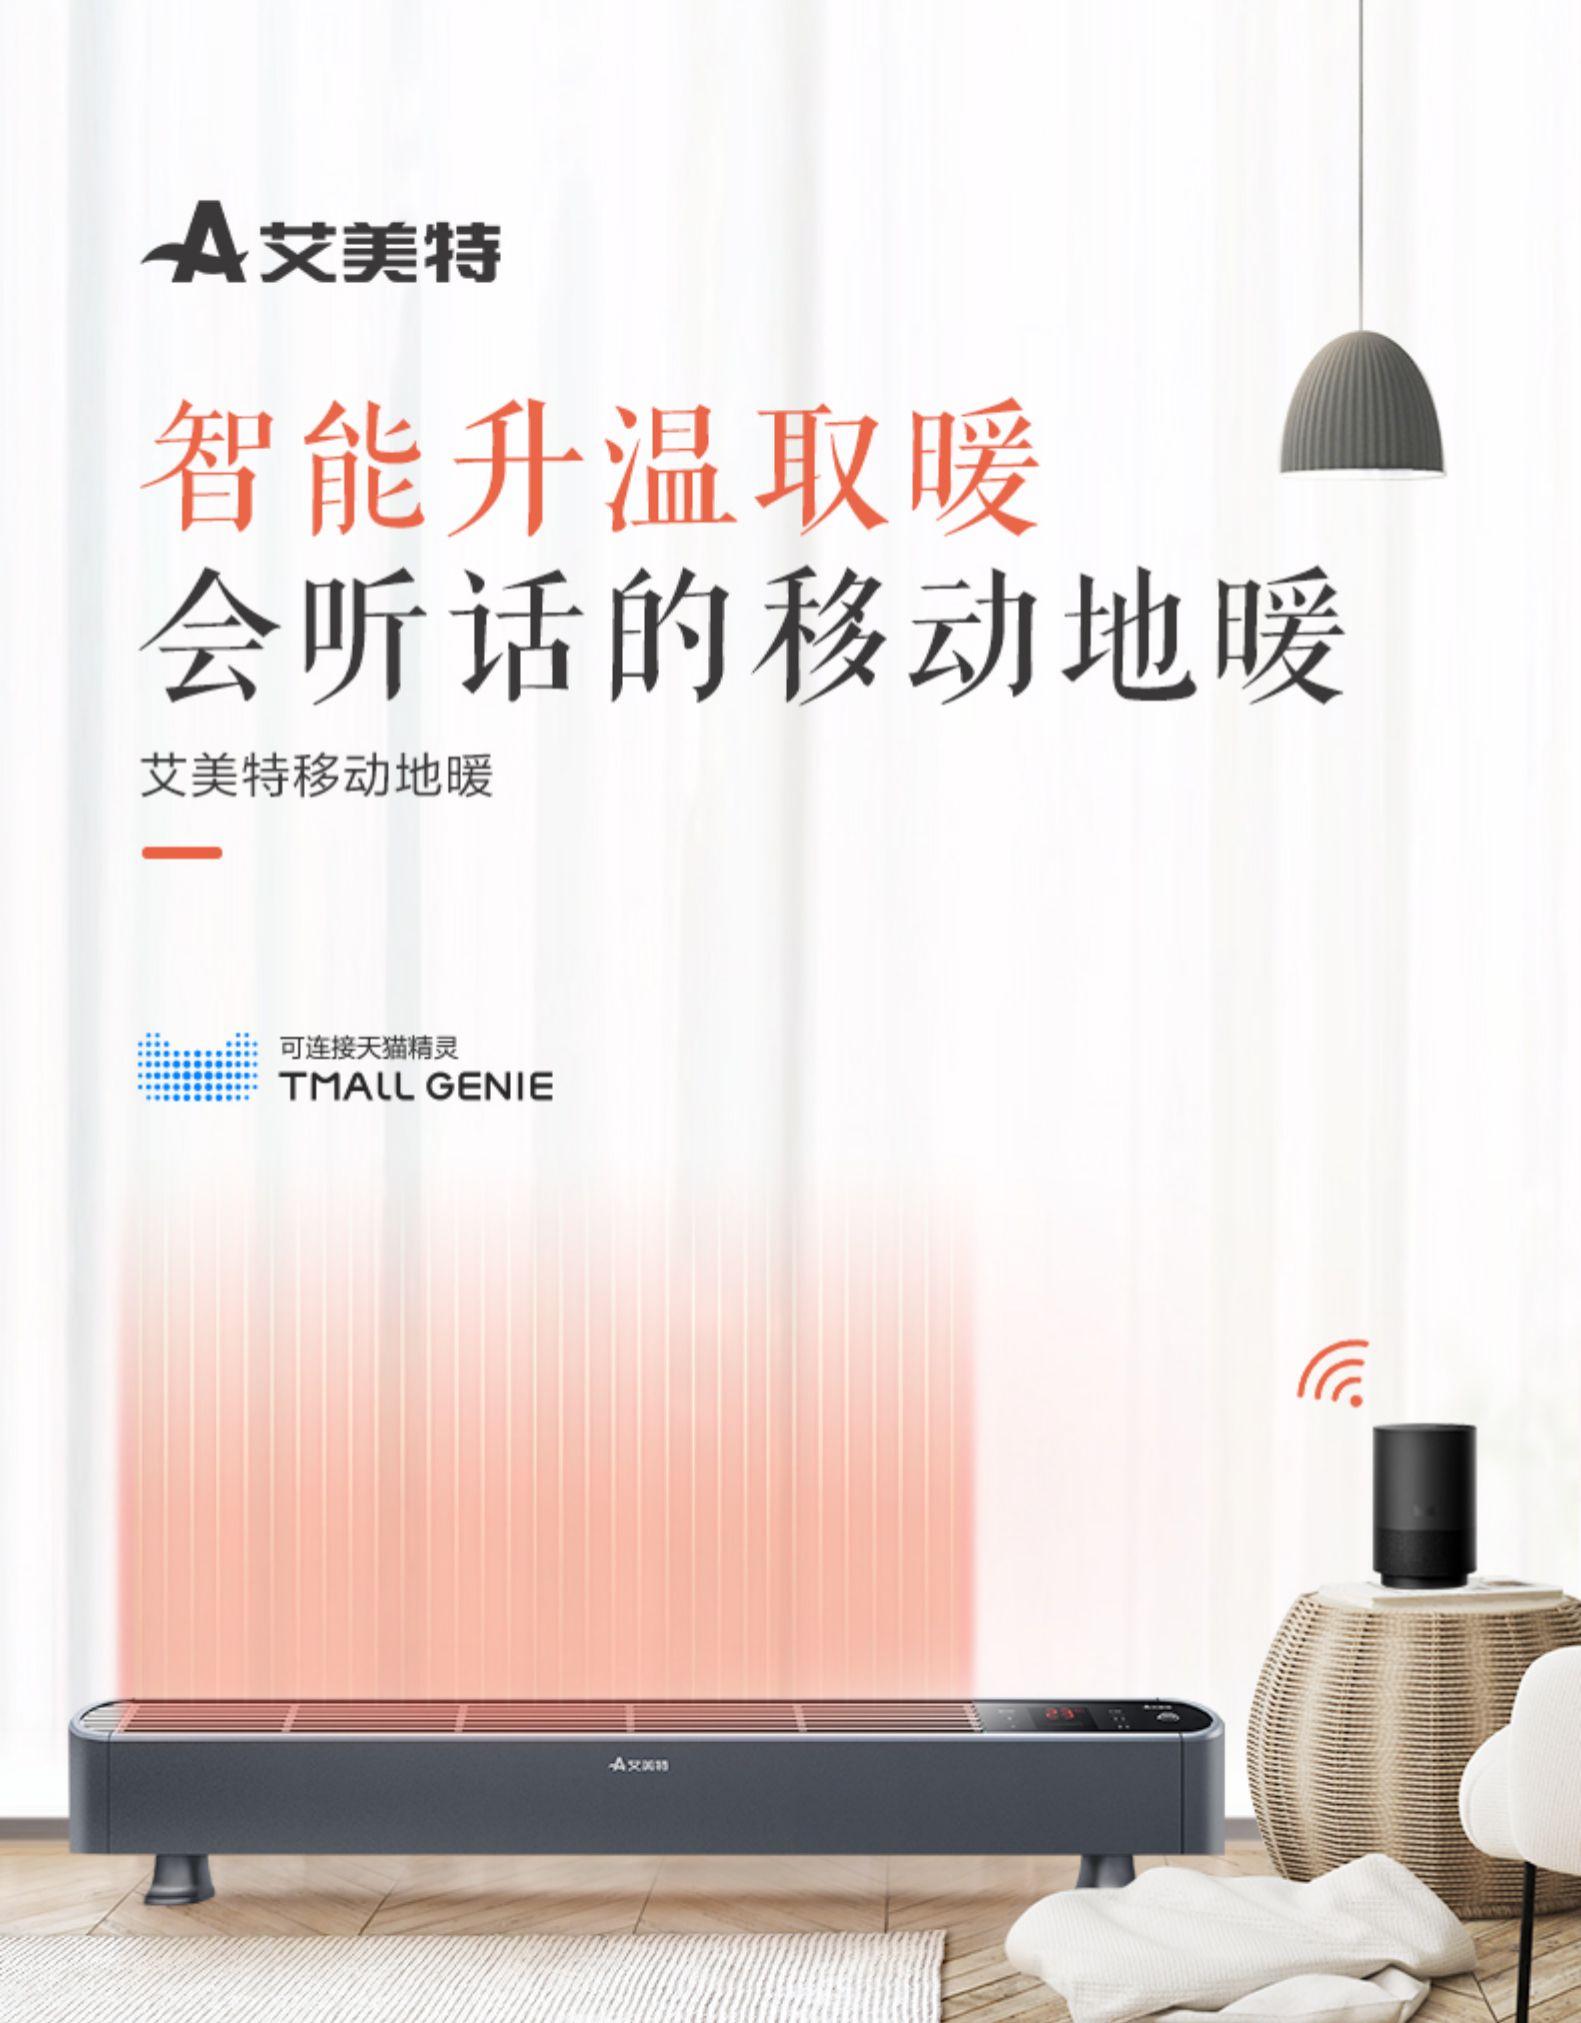 AIRMATE 艾美特 HCA22175R-WT 踢脚线取暖器 天猫优惠券折后¥599包邮(¥1499-900)